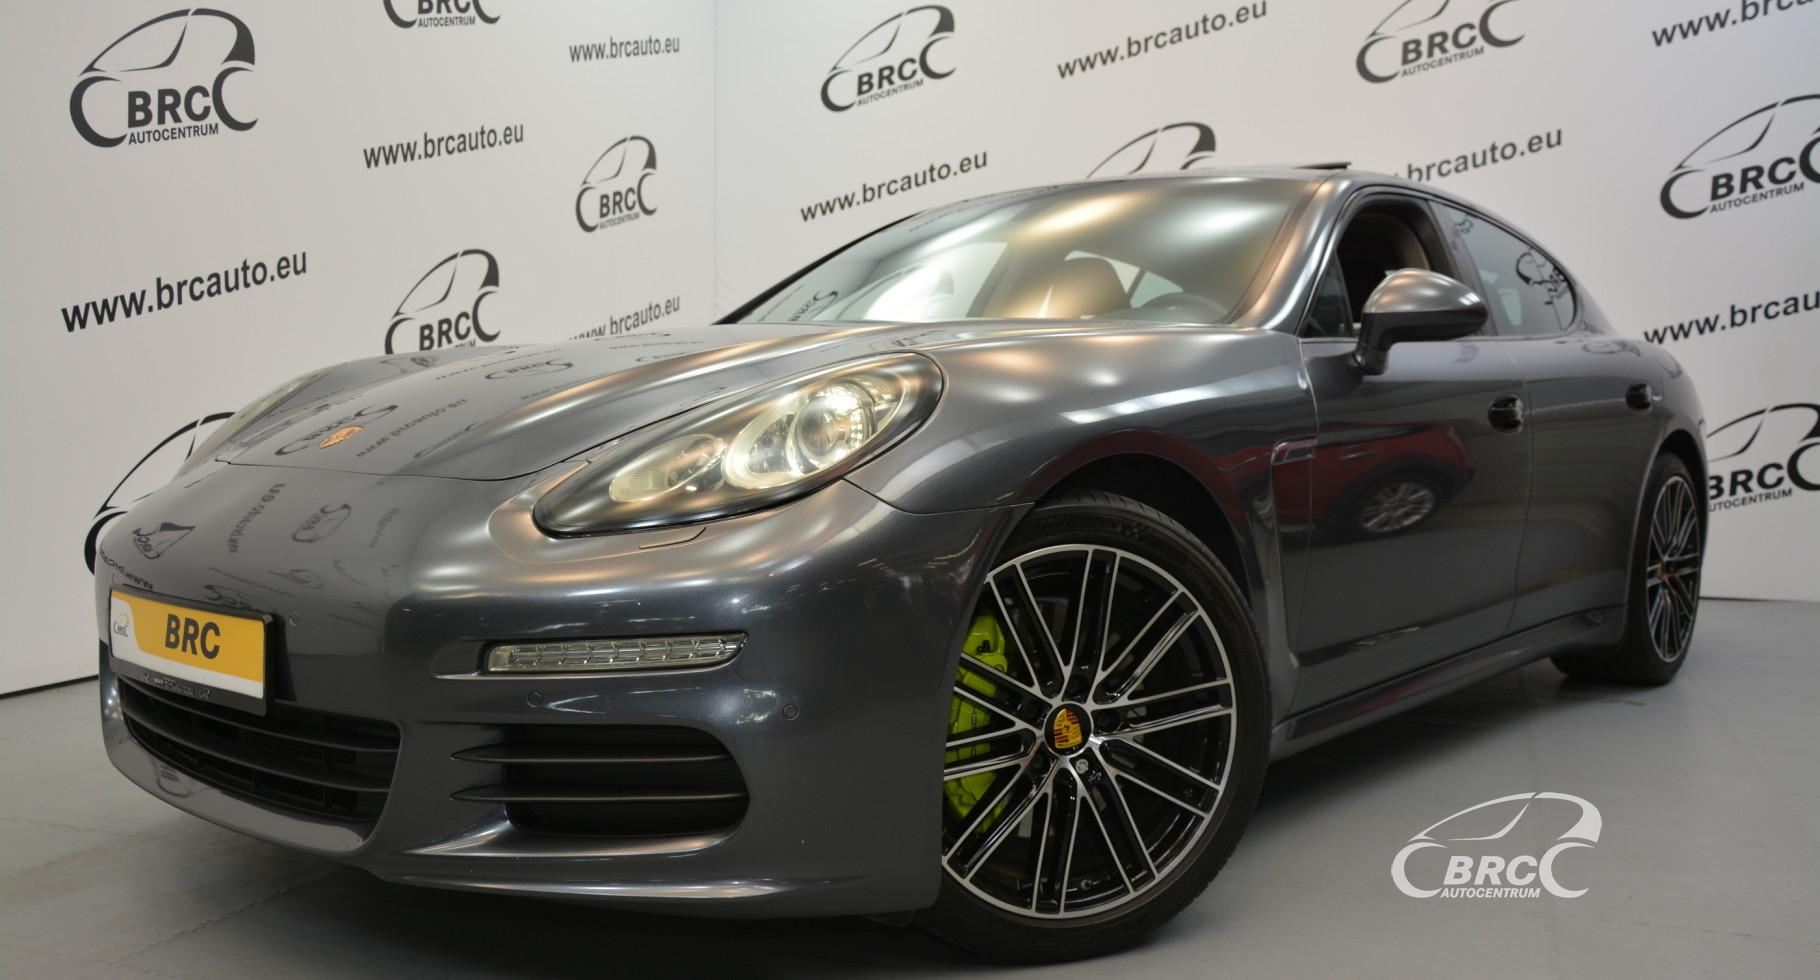 Porsche Panamera S E-Hybrid Automatas